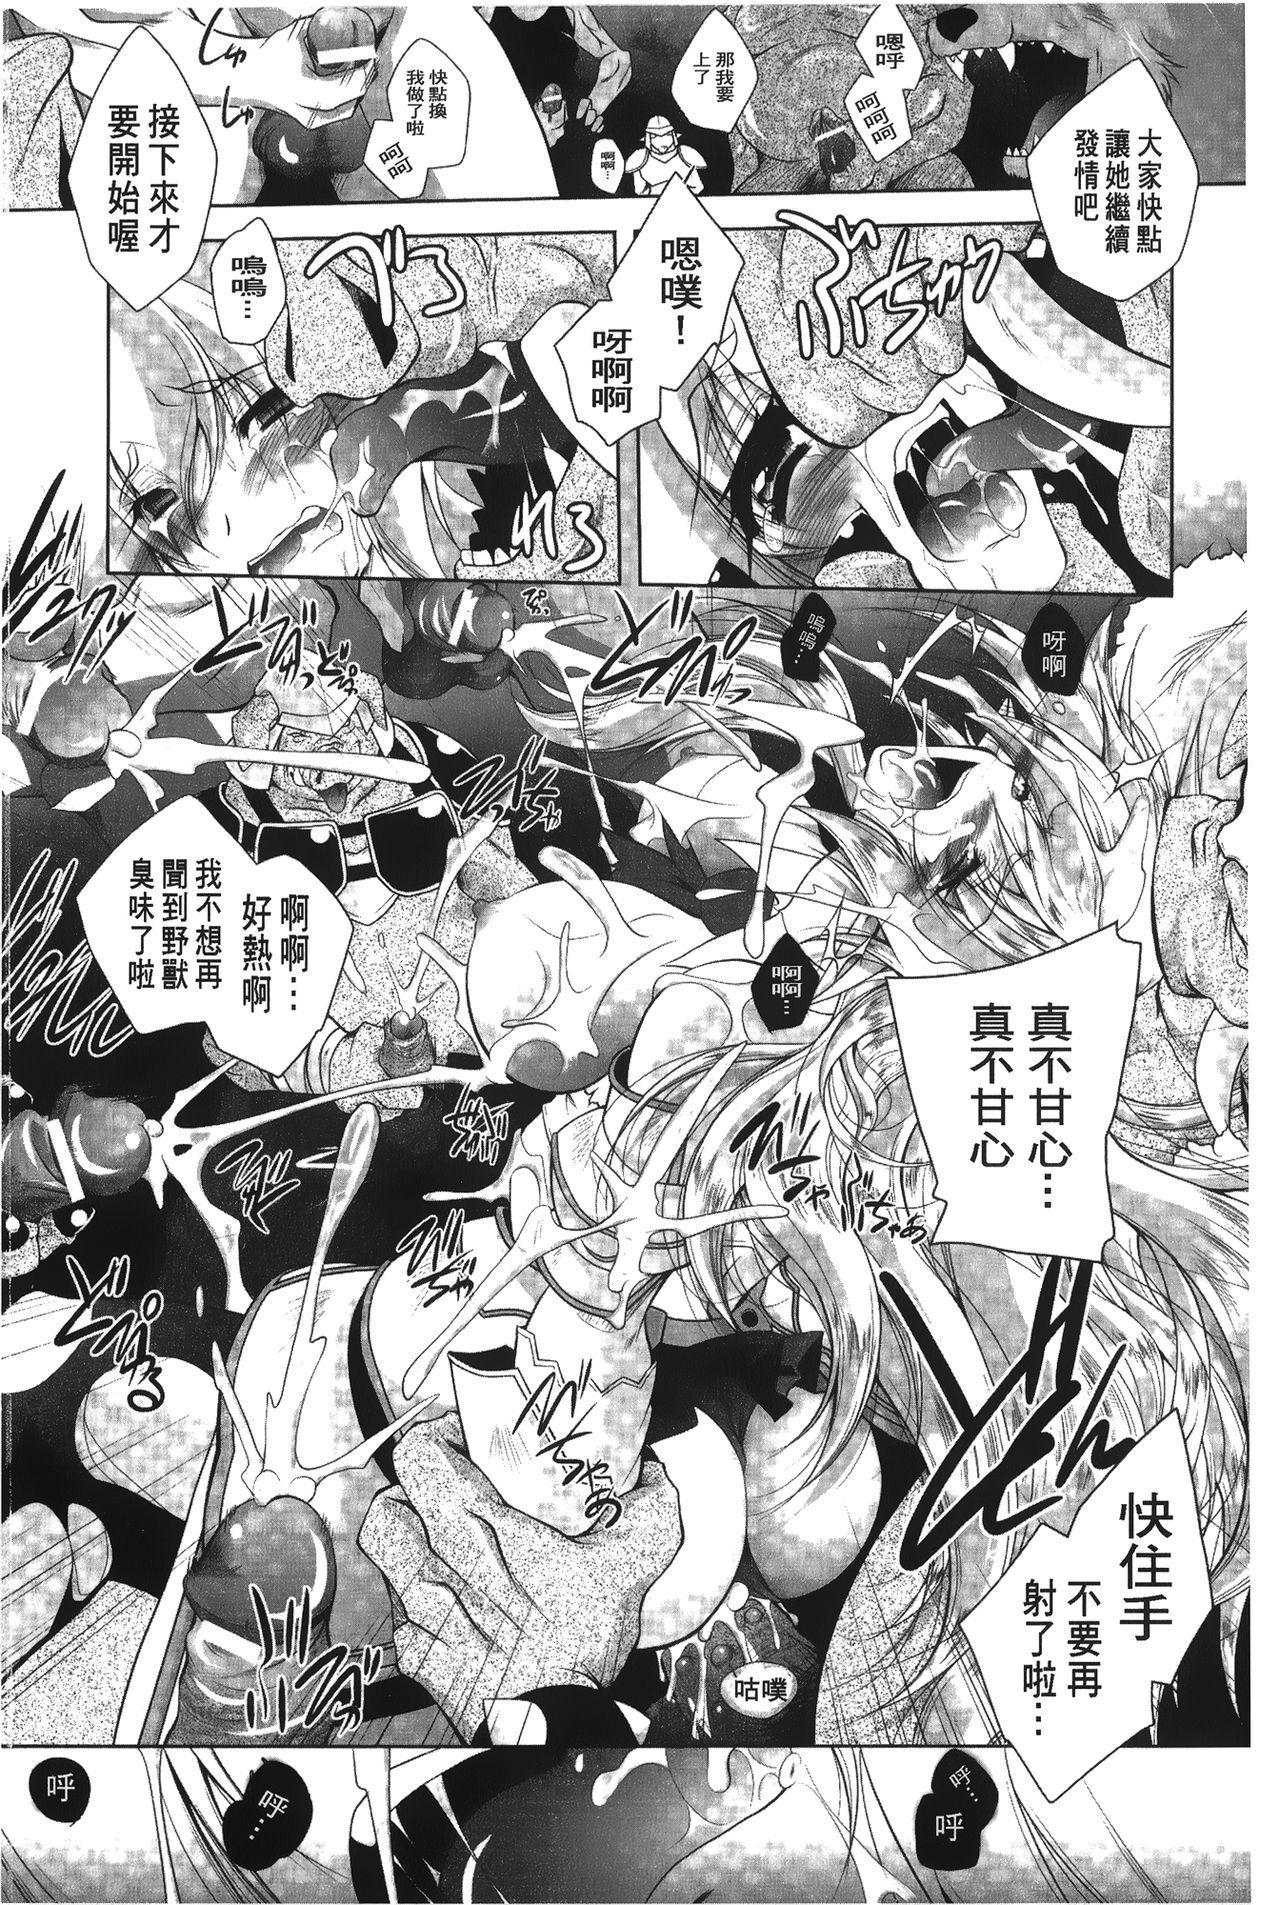 [Parfait] Datenshi-tachi no Rondo - Fallen Angels Rondo   墮天使們的圓舞曲 [Chinese] 39